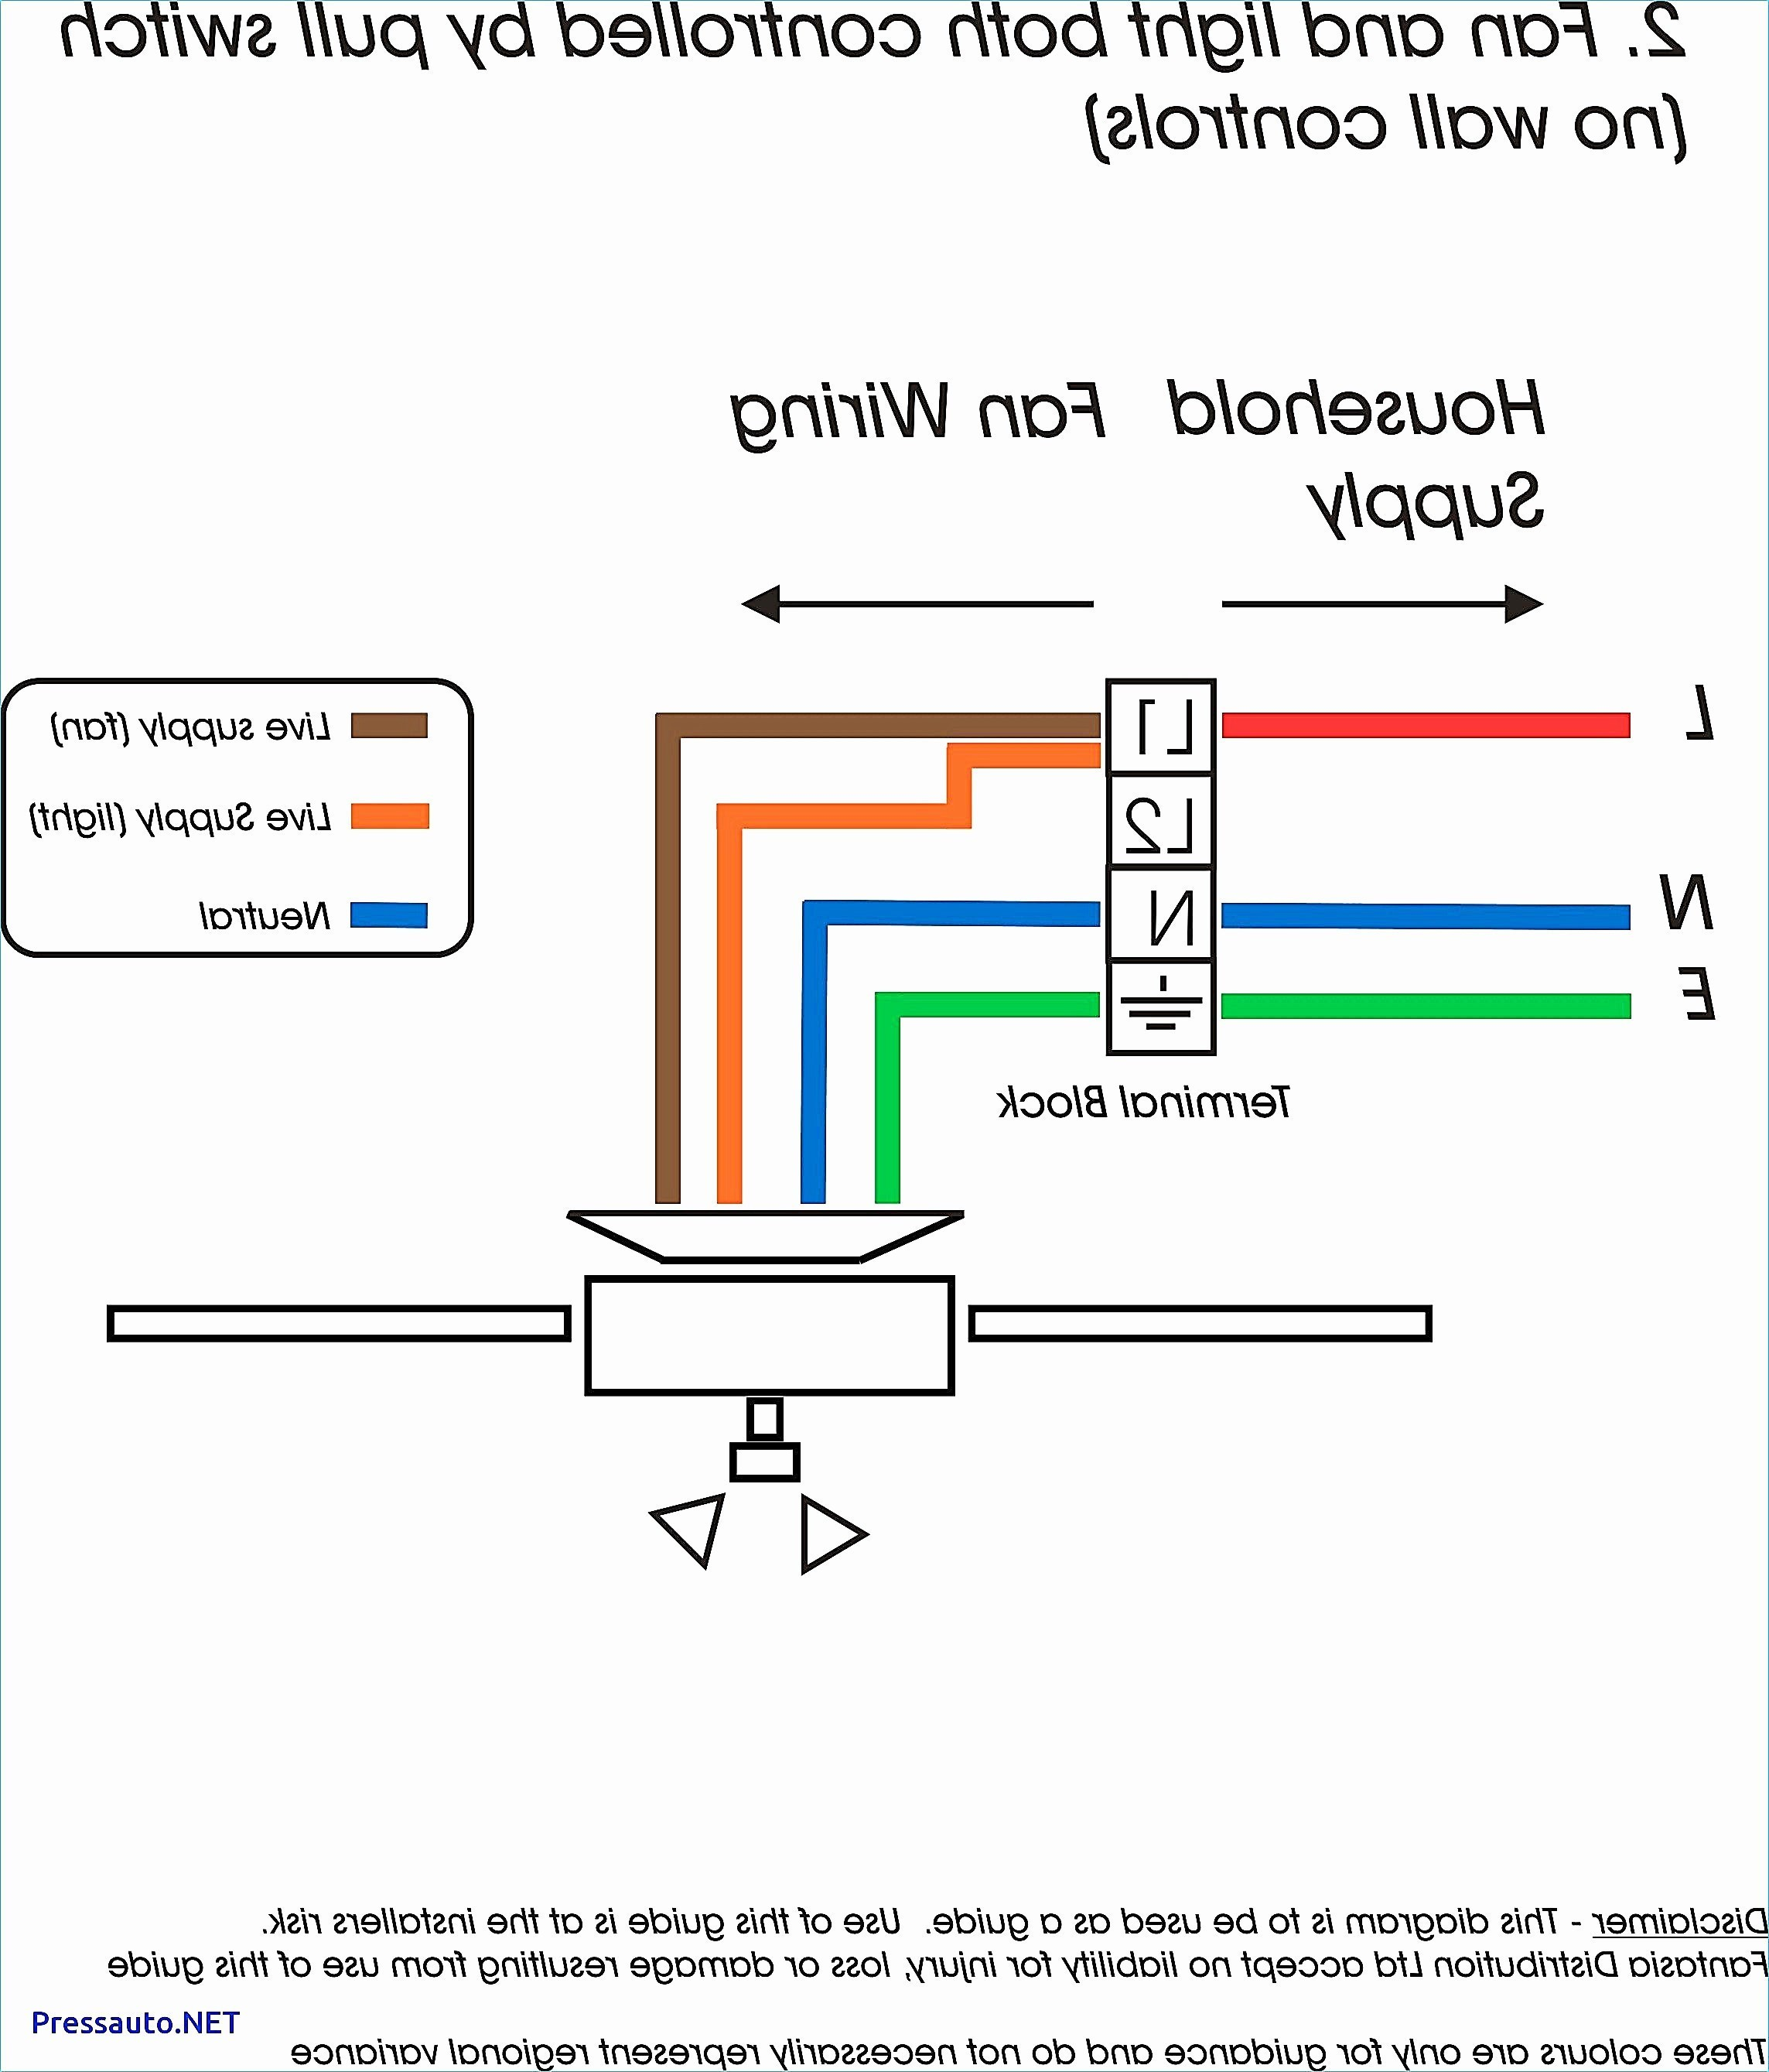 Car Stereo Installation Diagram Wiring Diagram Car Audio Amplifier Valid Car Audio Wiring Diagrams Of Car Stereo Installation Diagram